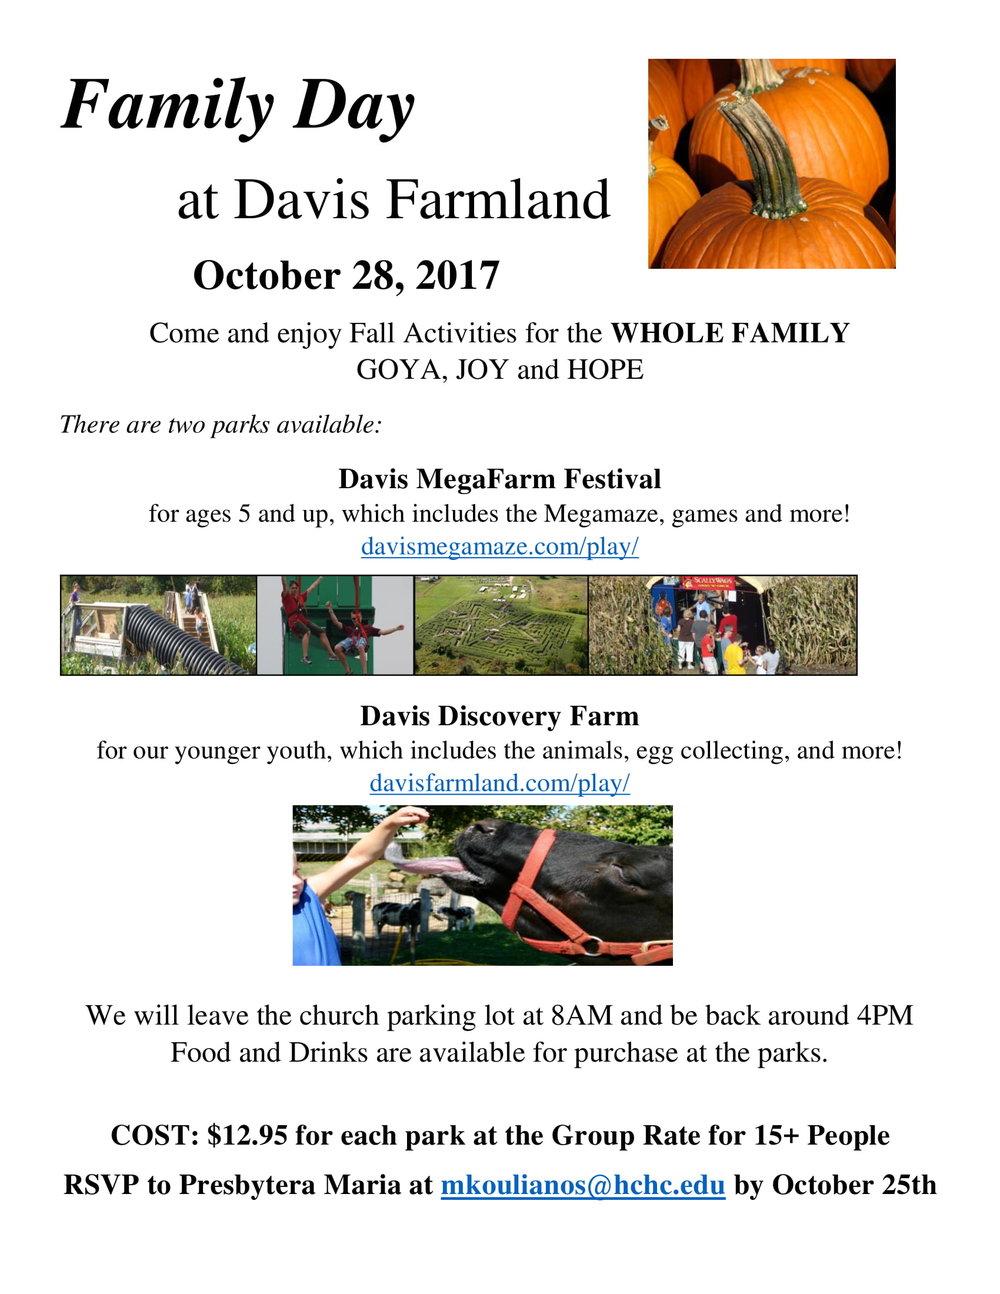 Family Day Davis Farm-1.jpg